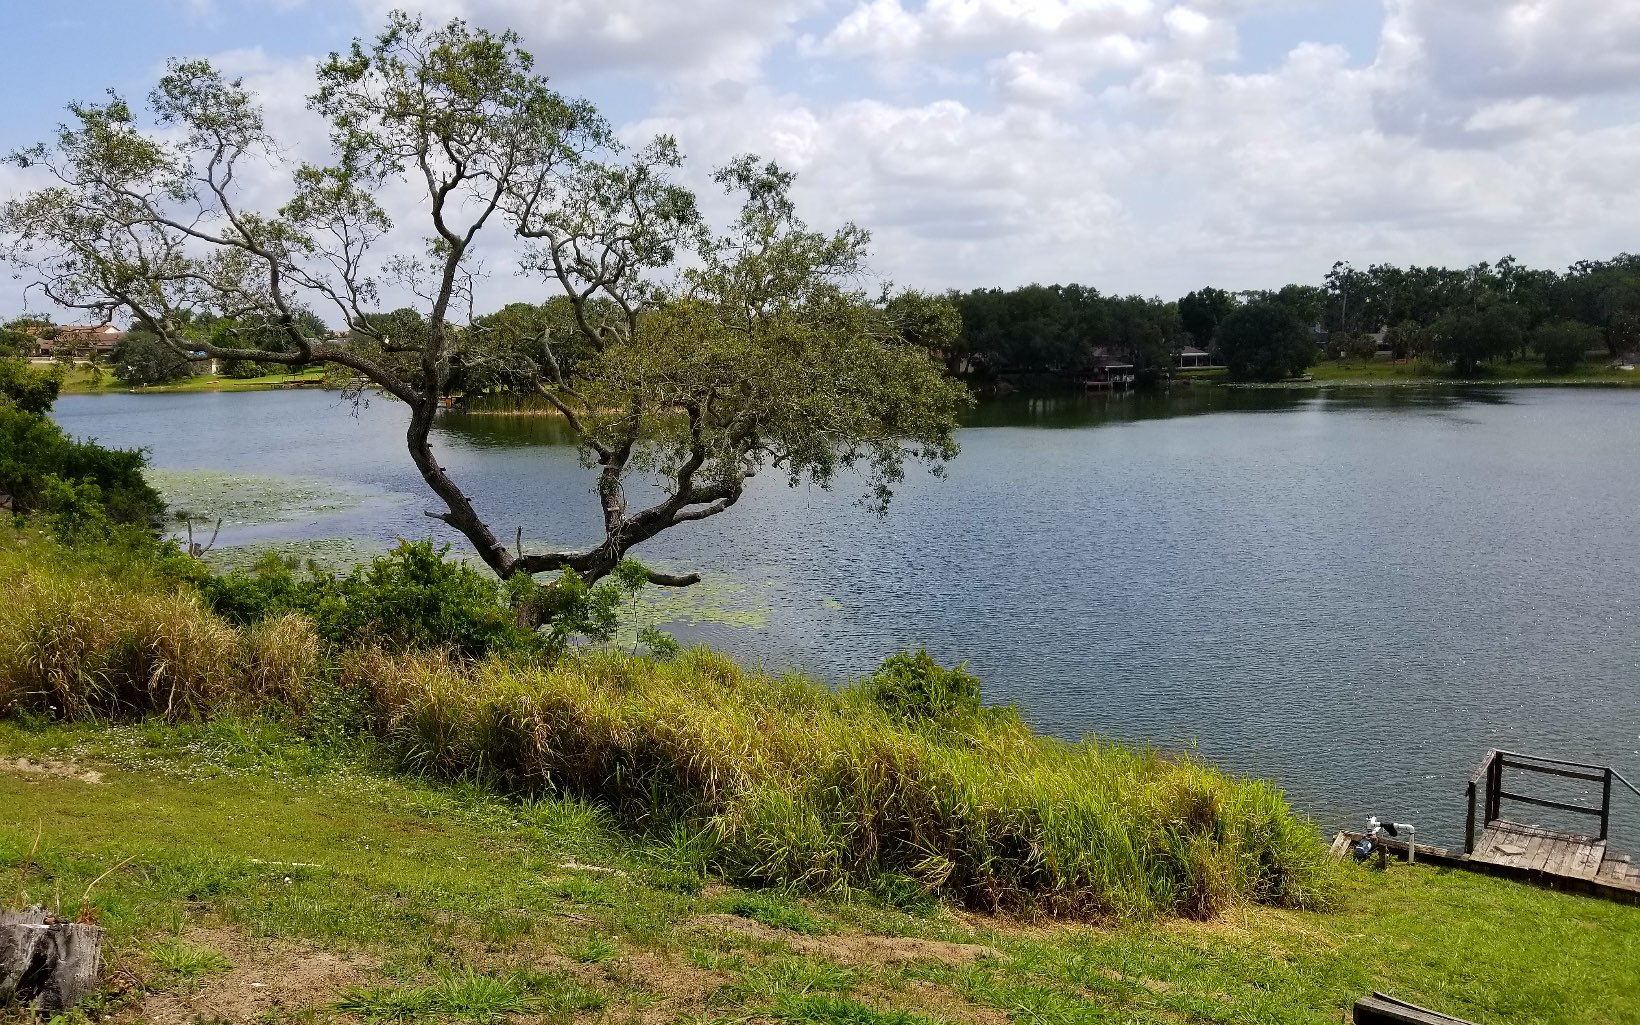 511 Lake Saddlebags Dr, Lake Placid, FL 33852